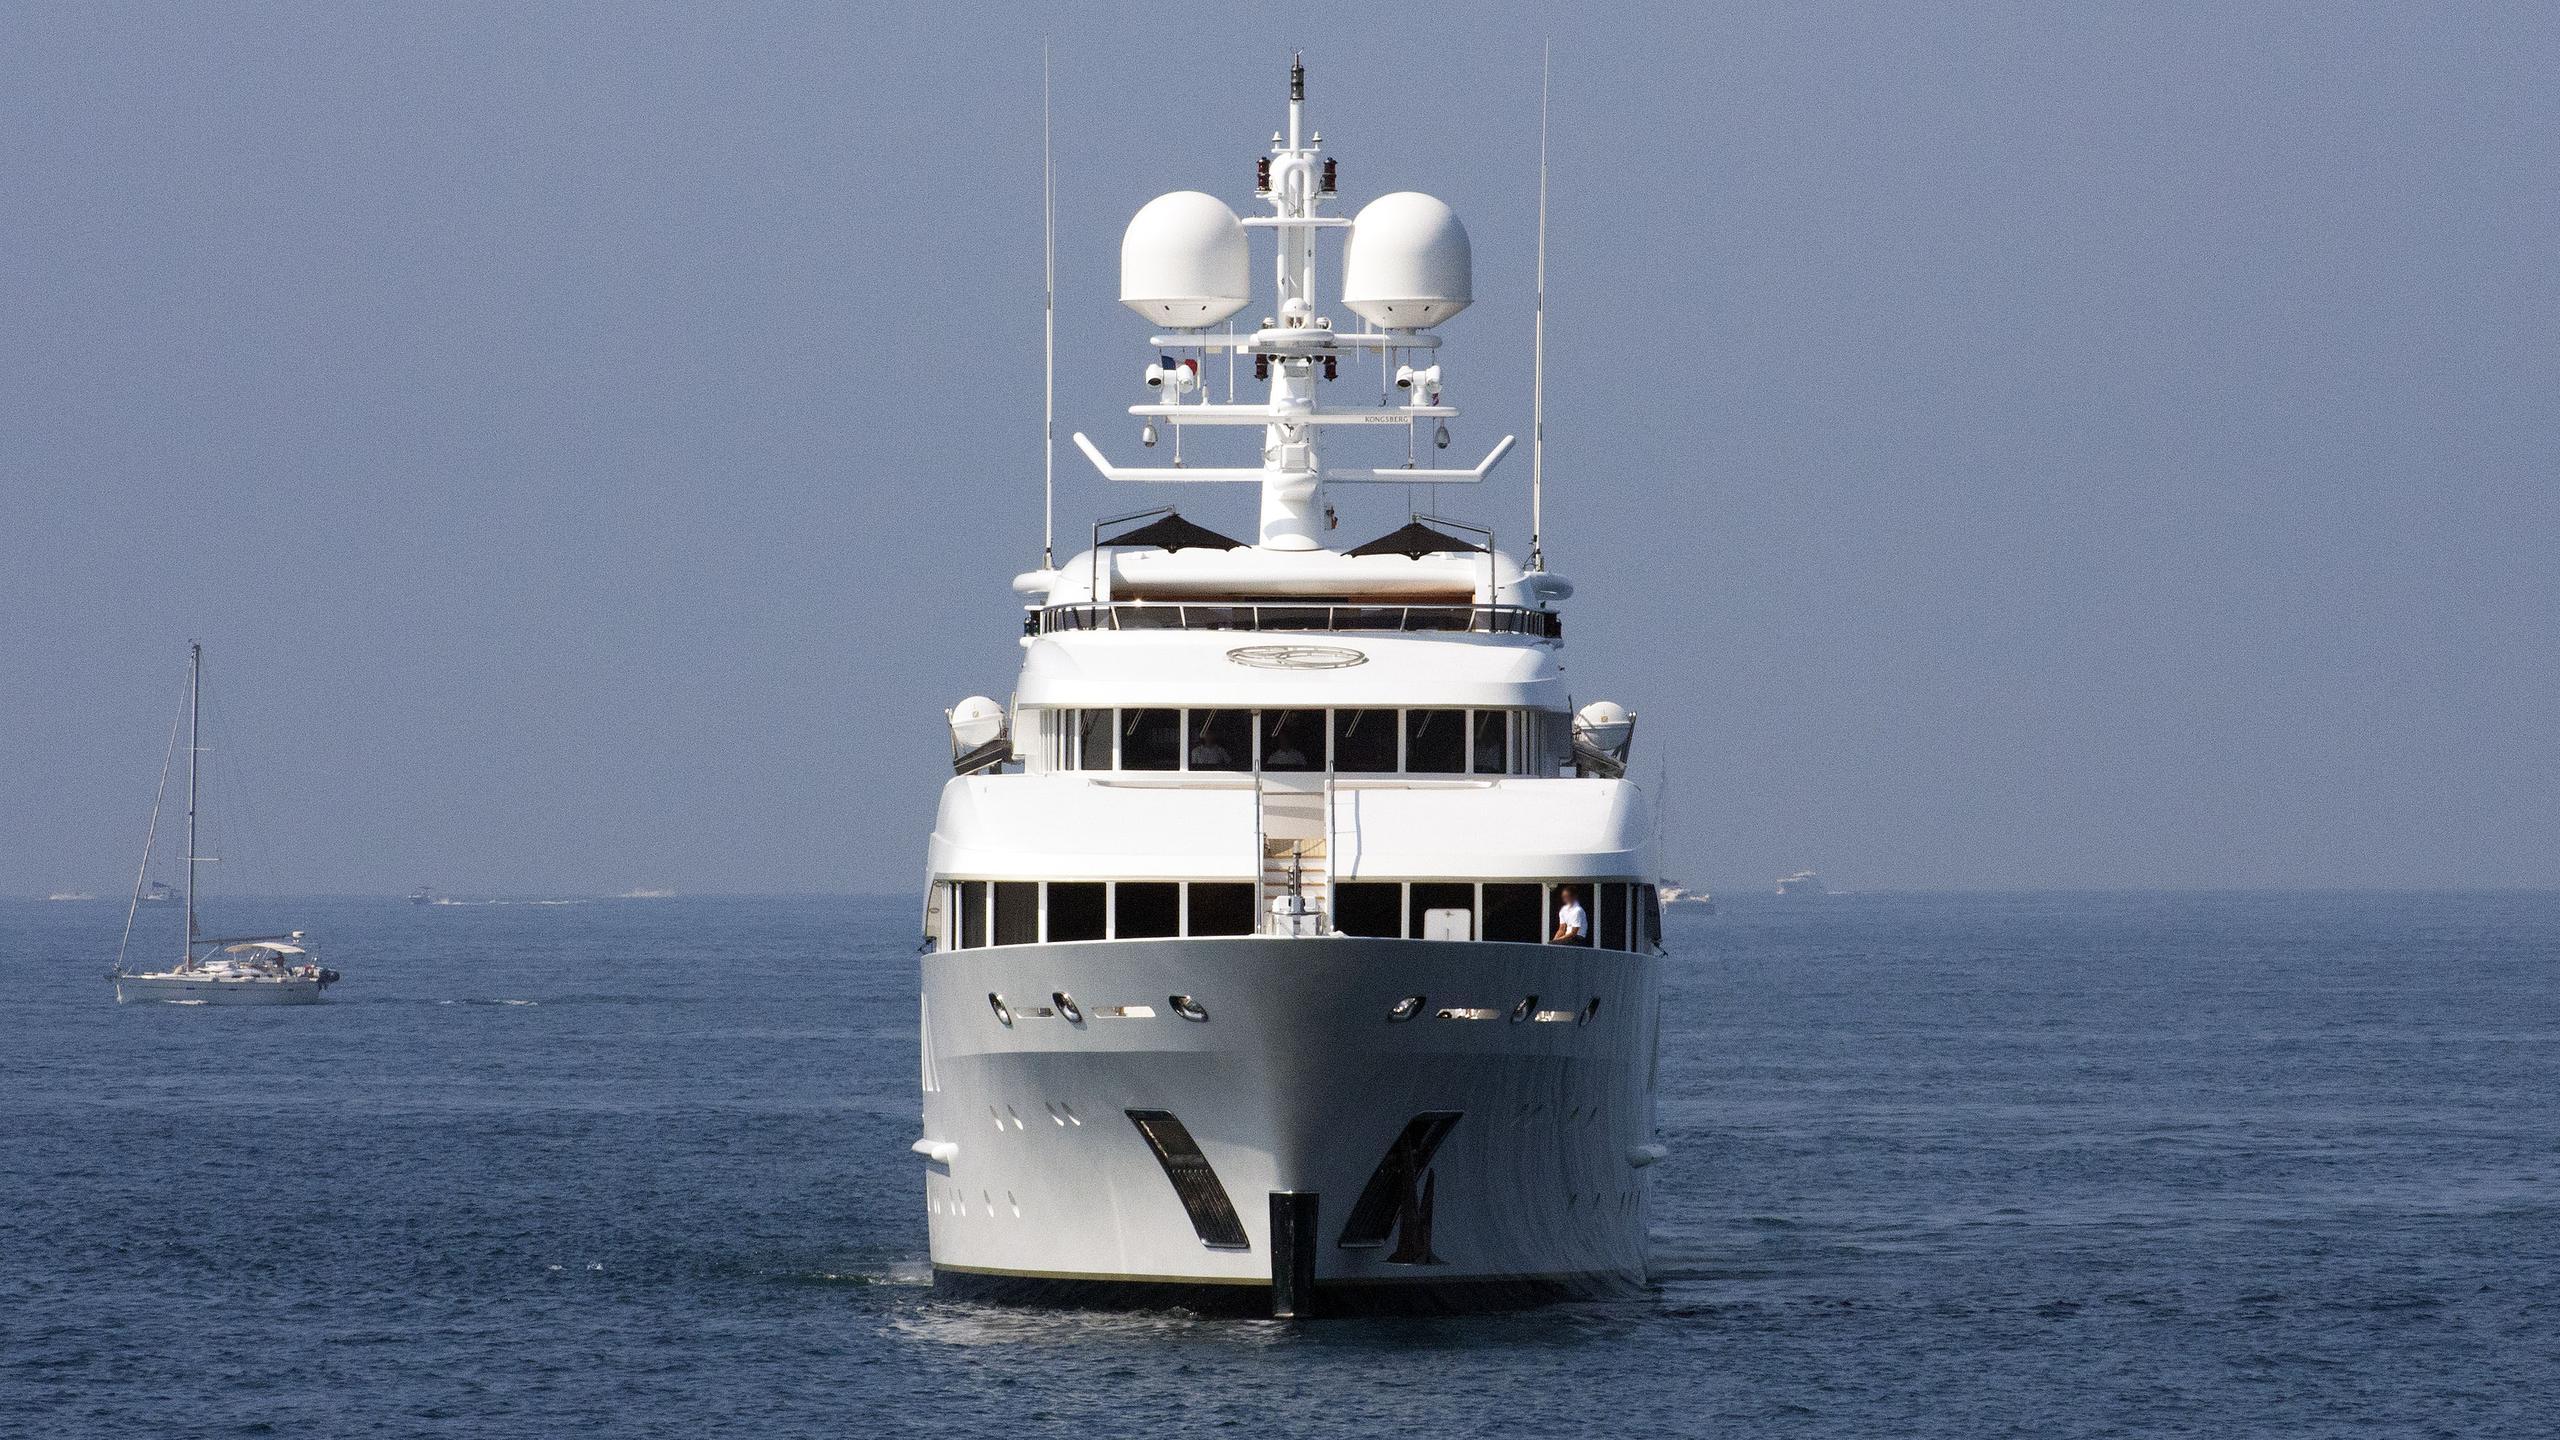 sealyon-motor-yacht-viareggio-2009-62m-bow